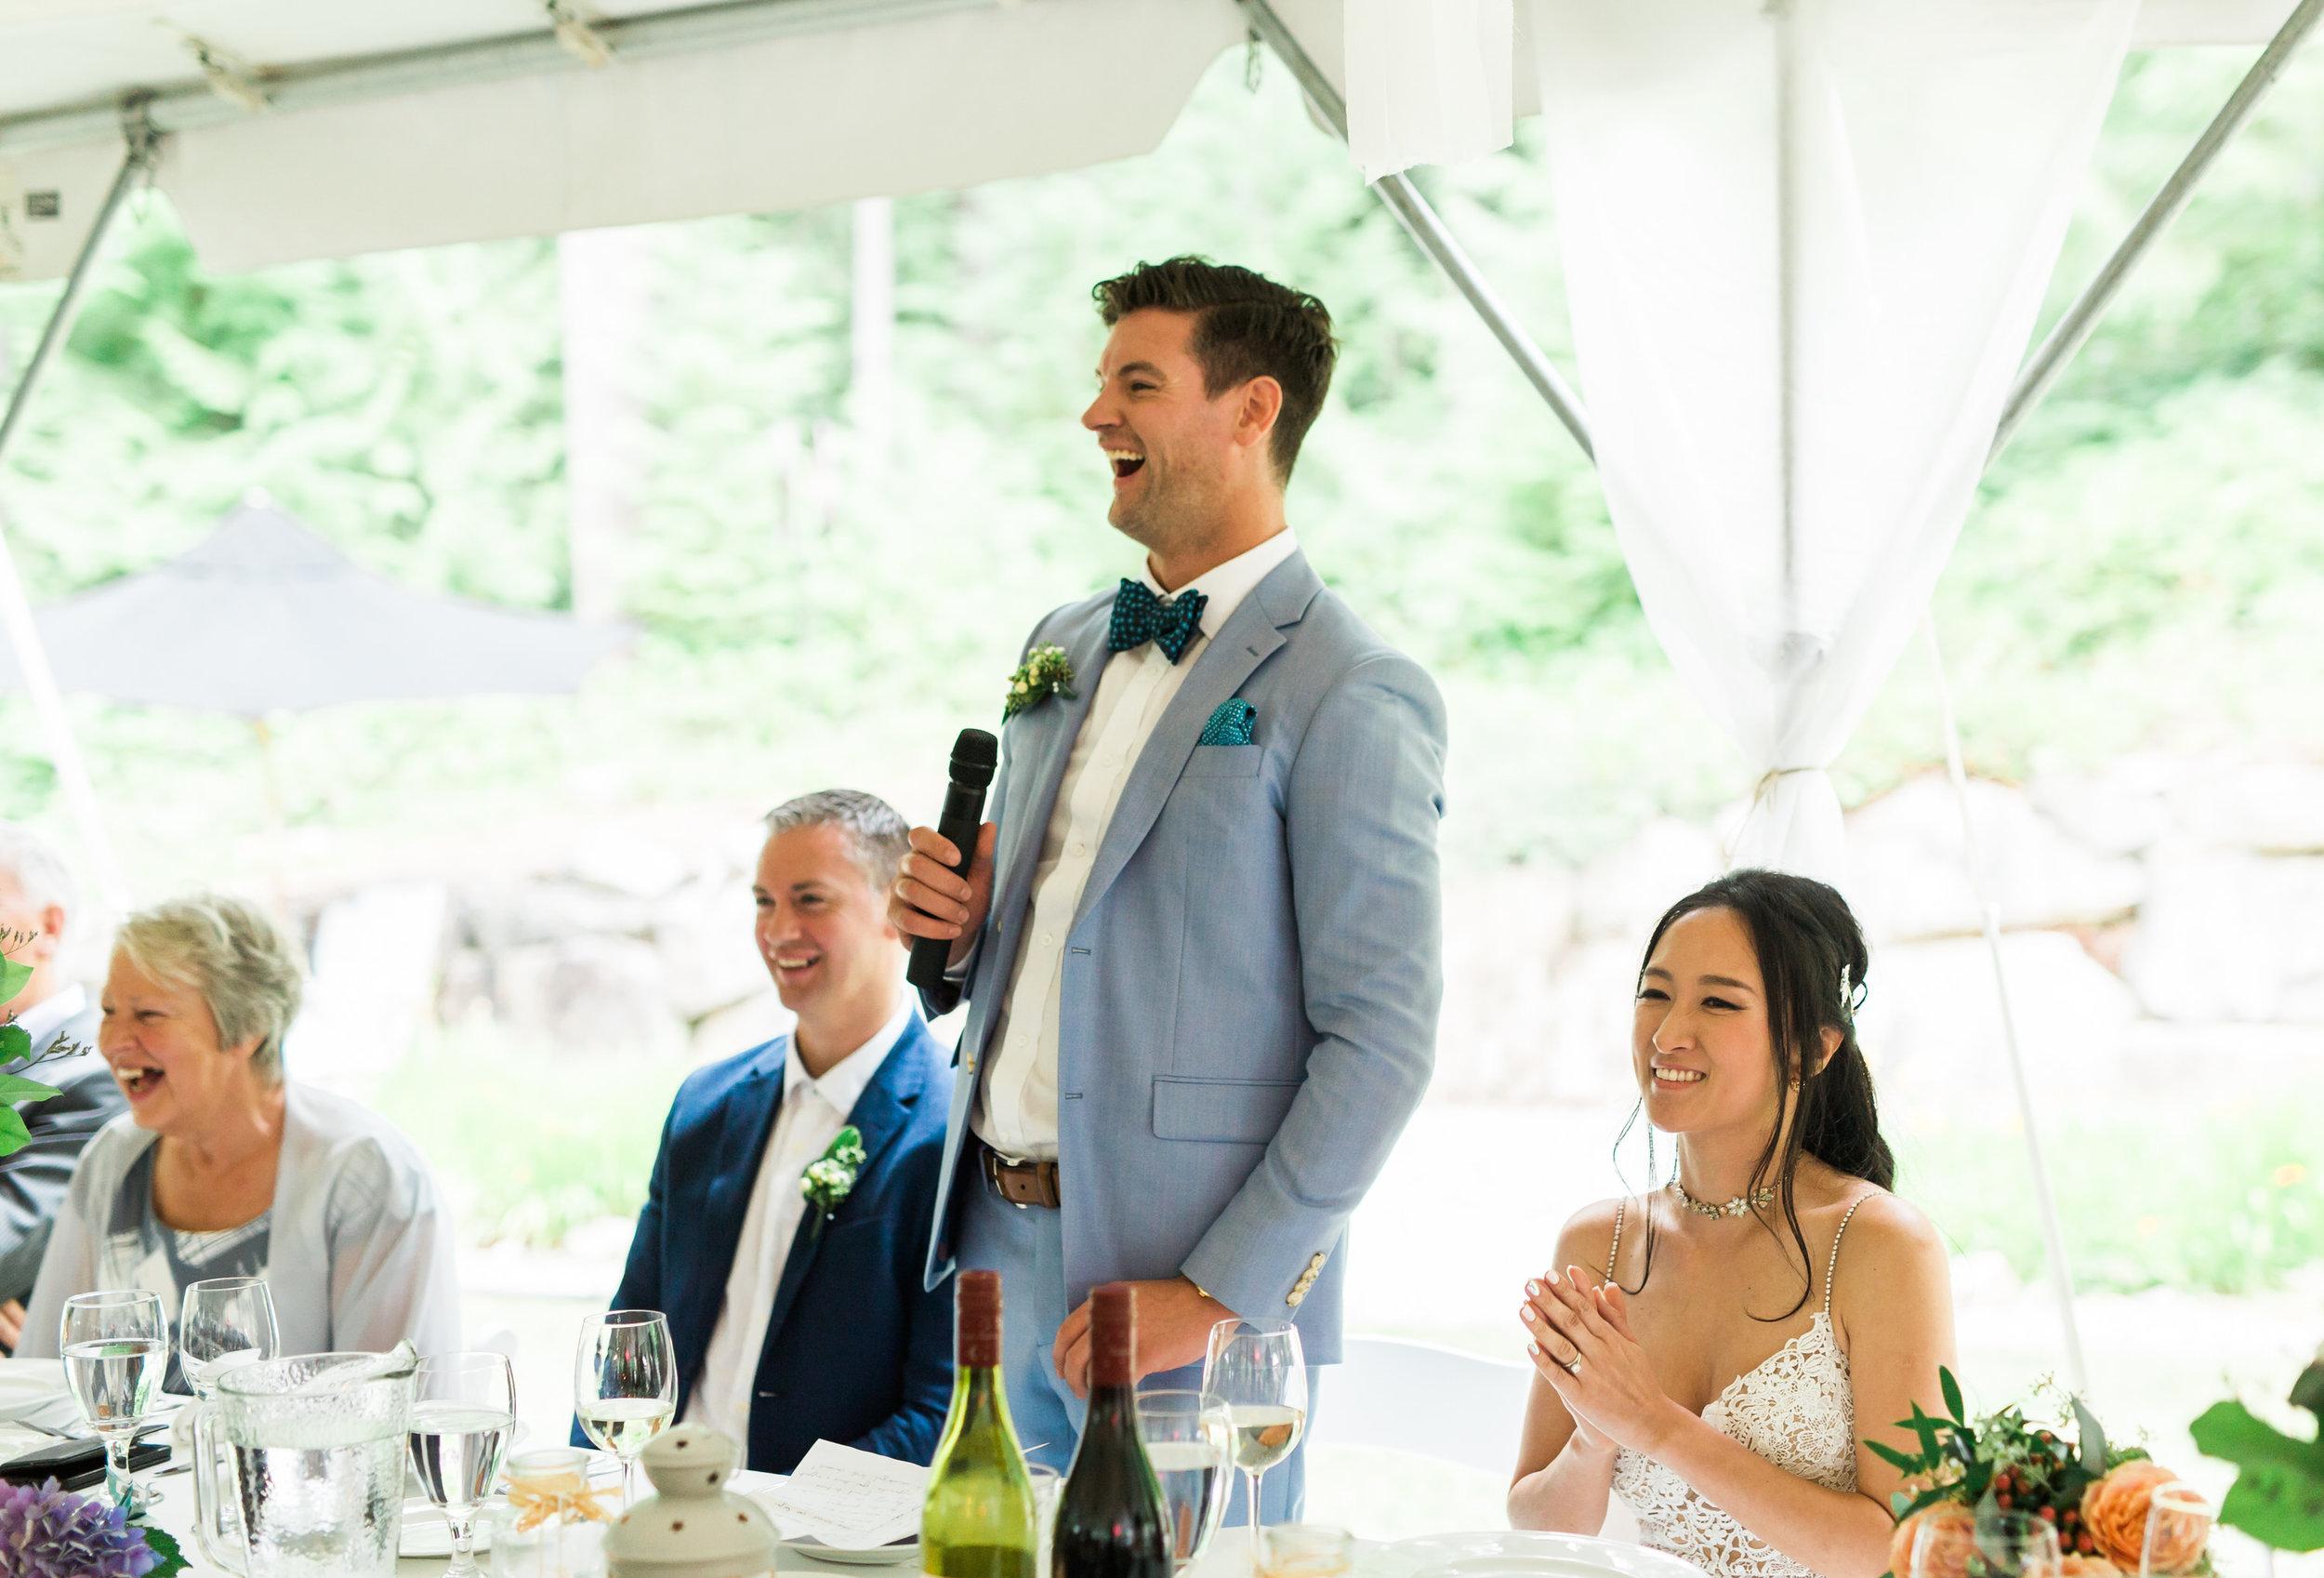 Linwood House Wedding Photos - Roberts Creek Wedding Photos - Vancouver Wedding Photographer & Videographer - Sunshine Coast Wedding Photos - Sunshine Coast Wedding Photographer - Jennifer Picard Photography - IMG_8756.jpg